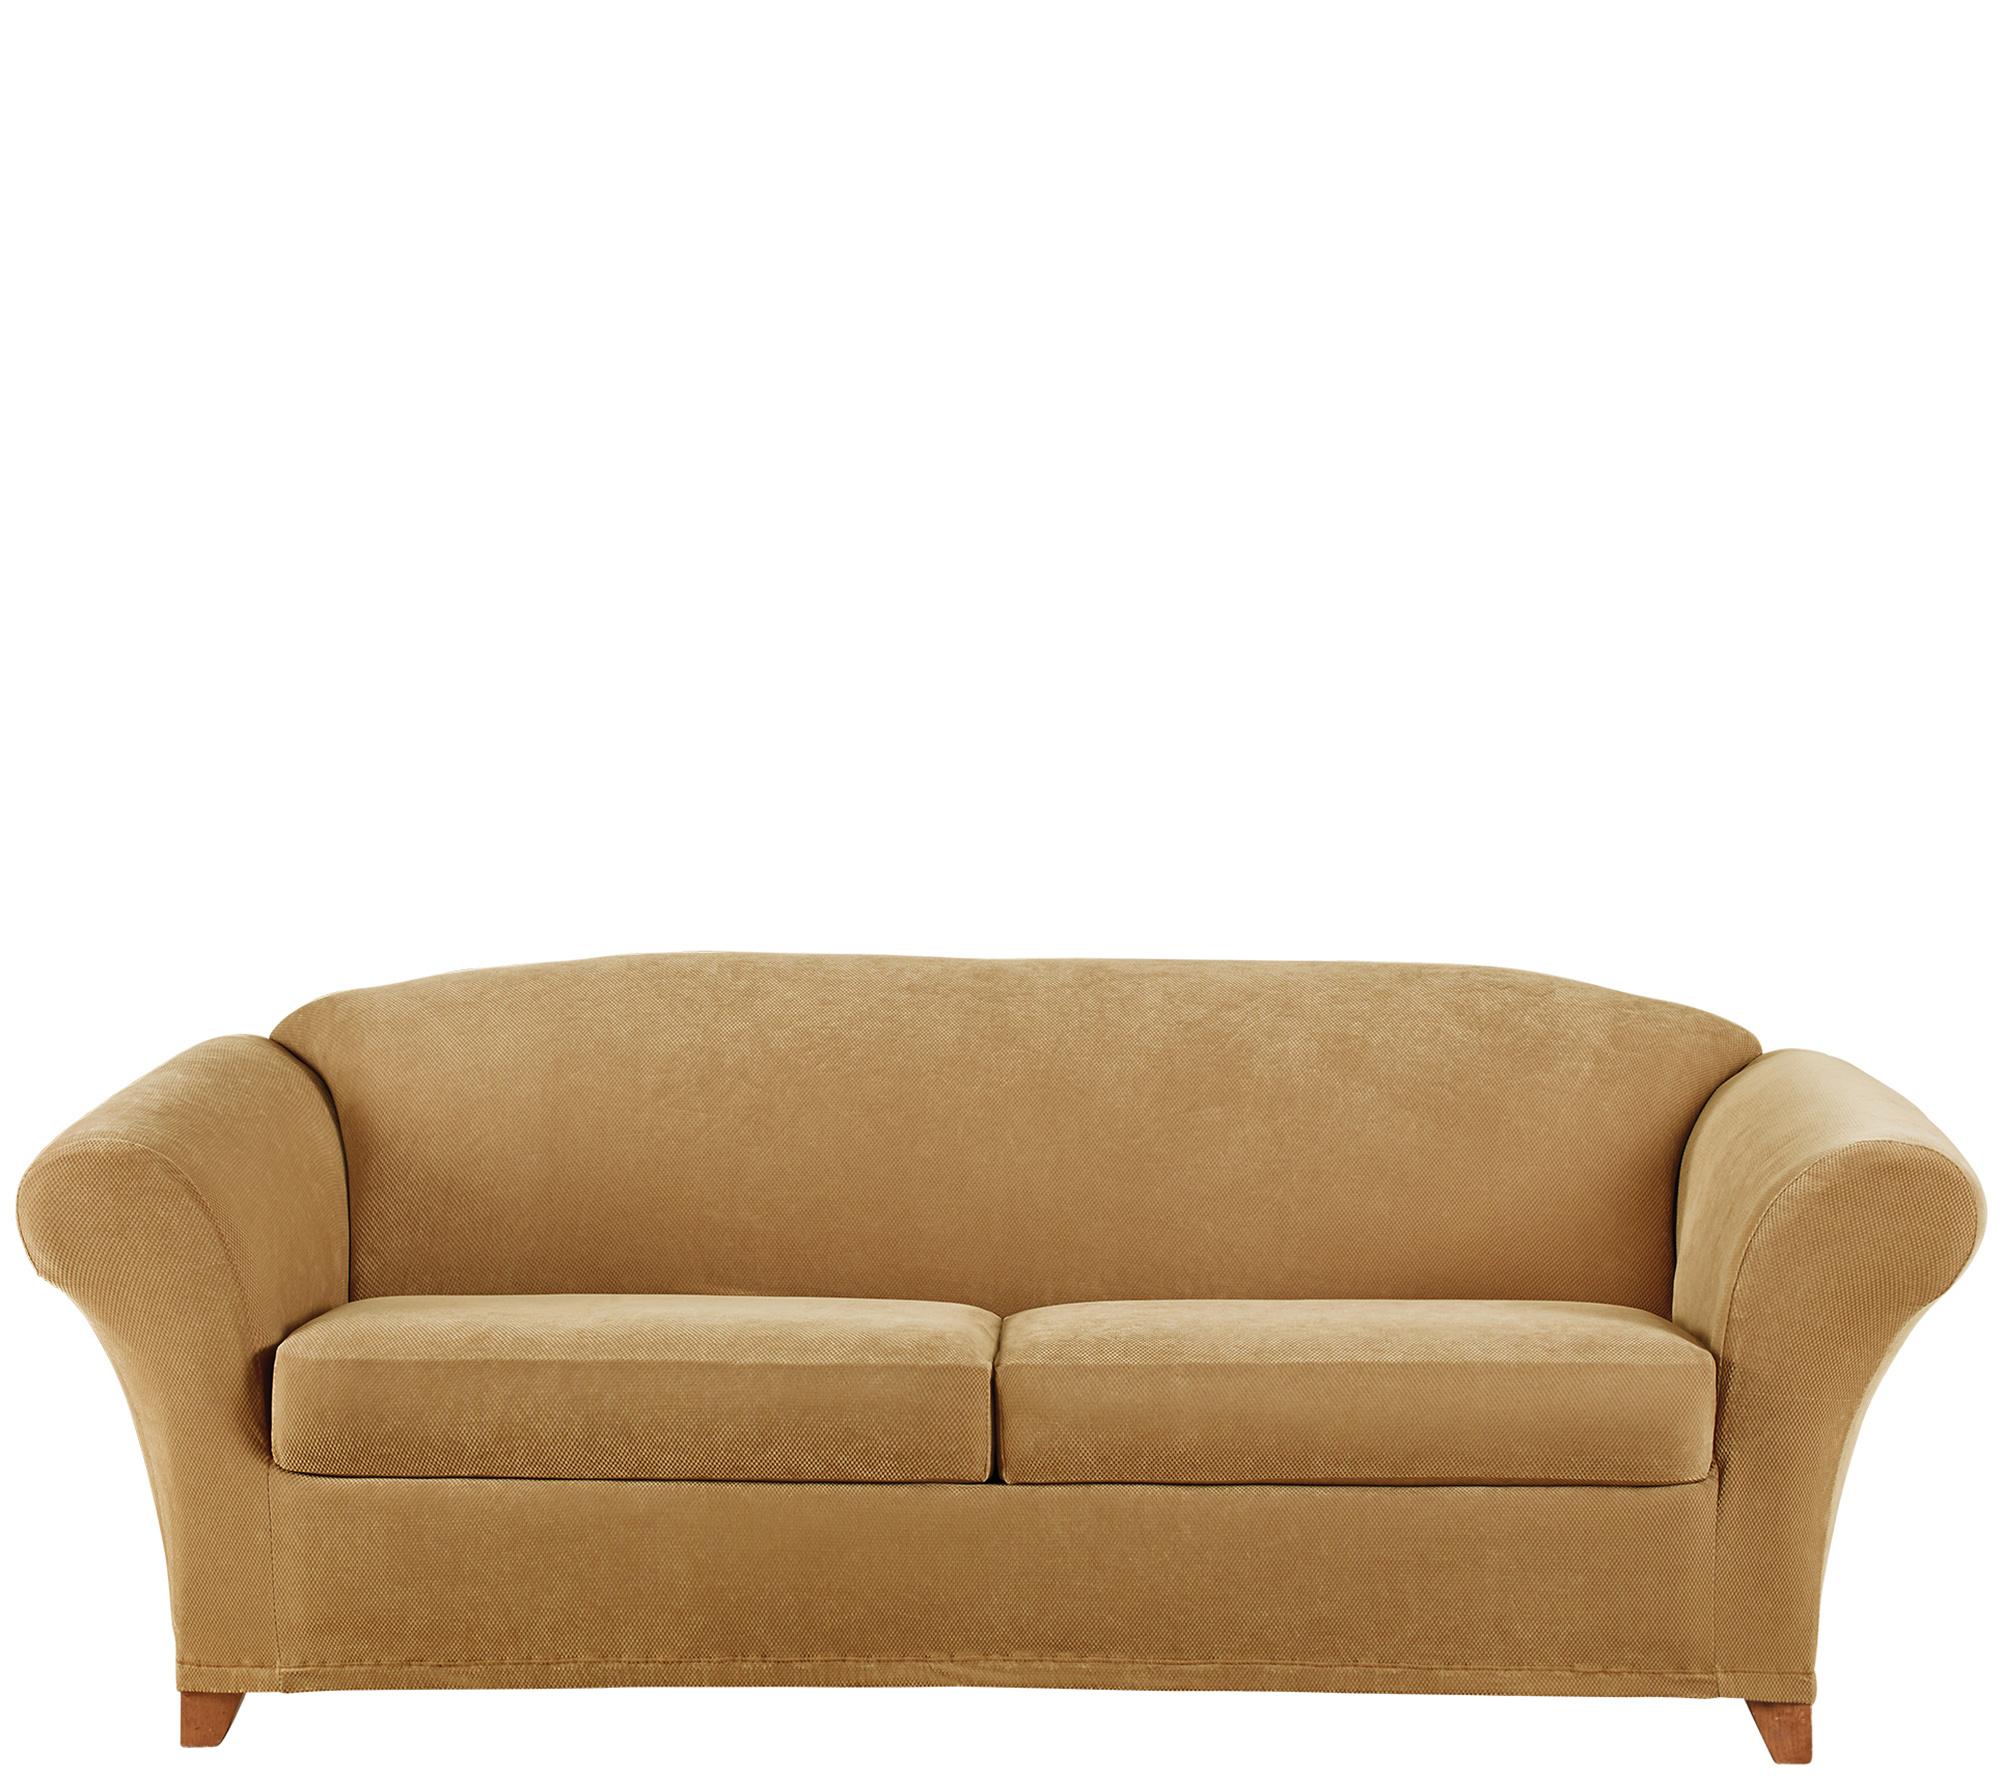 Sure Fit Stretch Pique 2 Seat Sofa Slipcover Page 1 Qvc Com